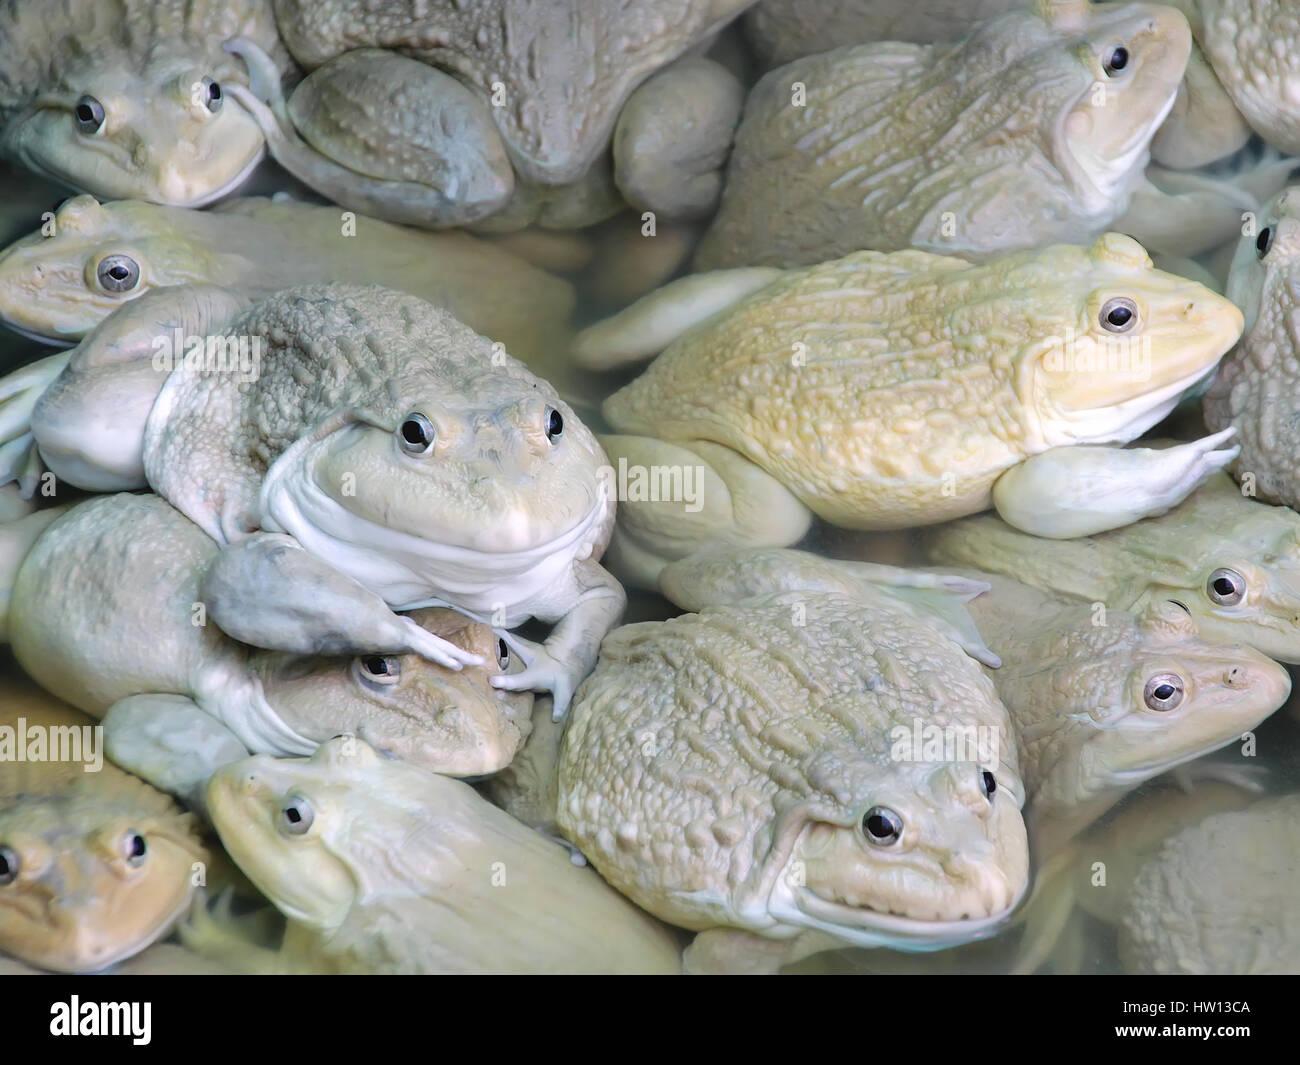 Ranas en la granja - Chino comestible, RANA rana toro de Asia oriental, la taiwanesa frog Imagen De Stock